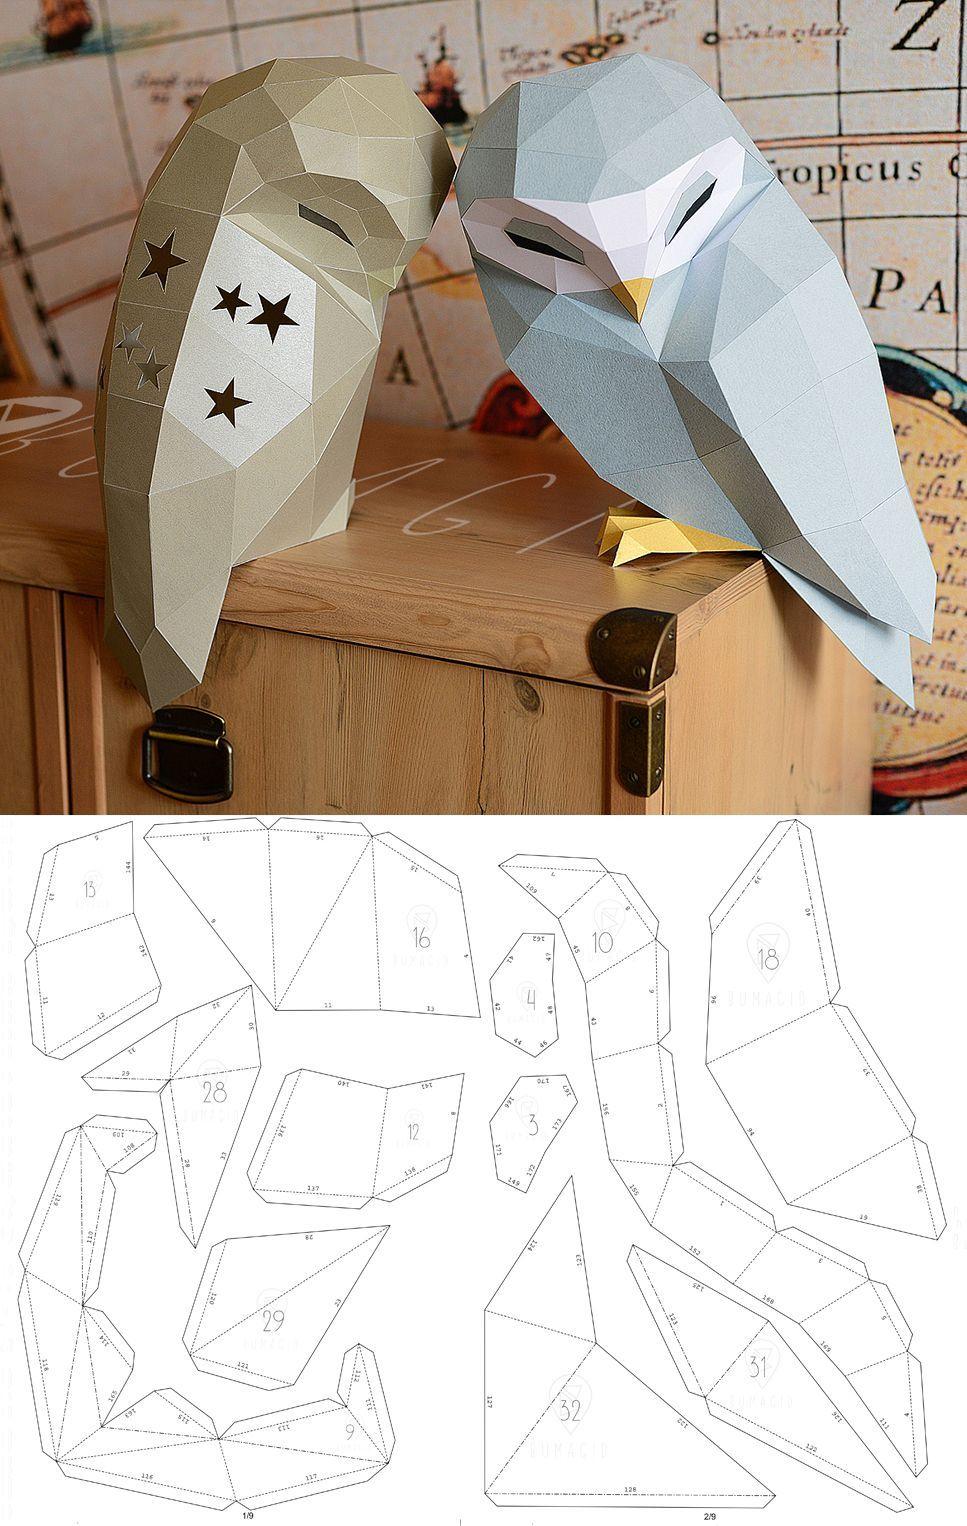 Owl Model Owl Low poly Owl Sculpture Owl paper Papercraft Kit DIY 3D Paper Crafts animals